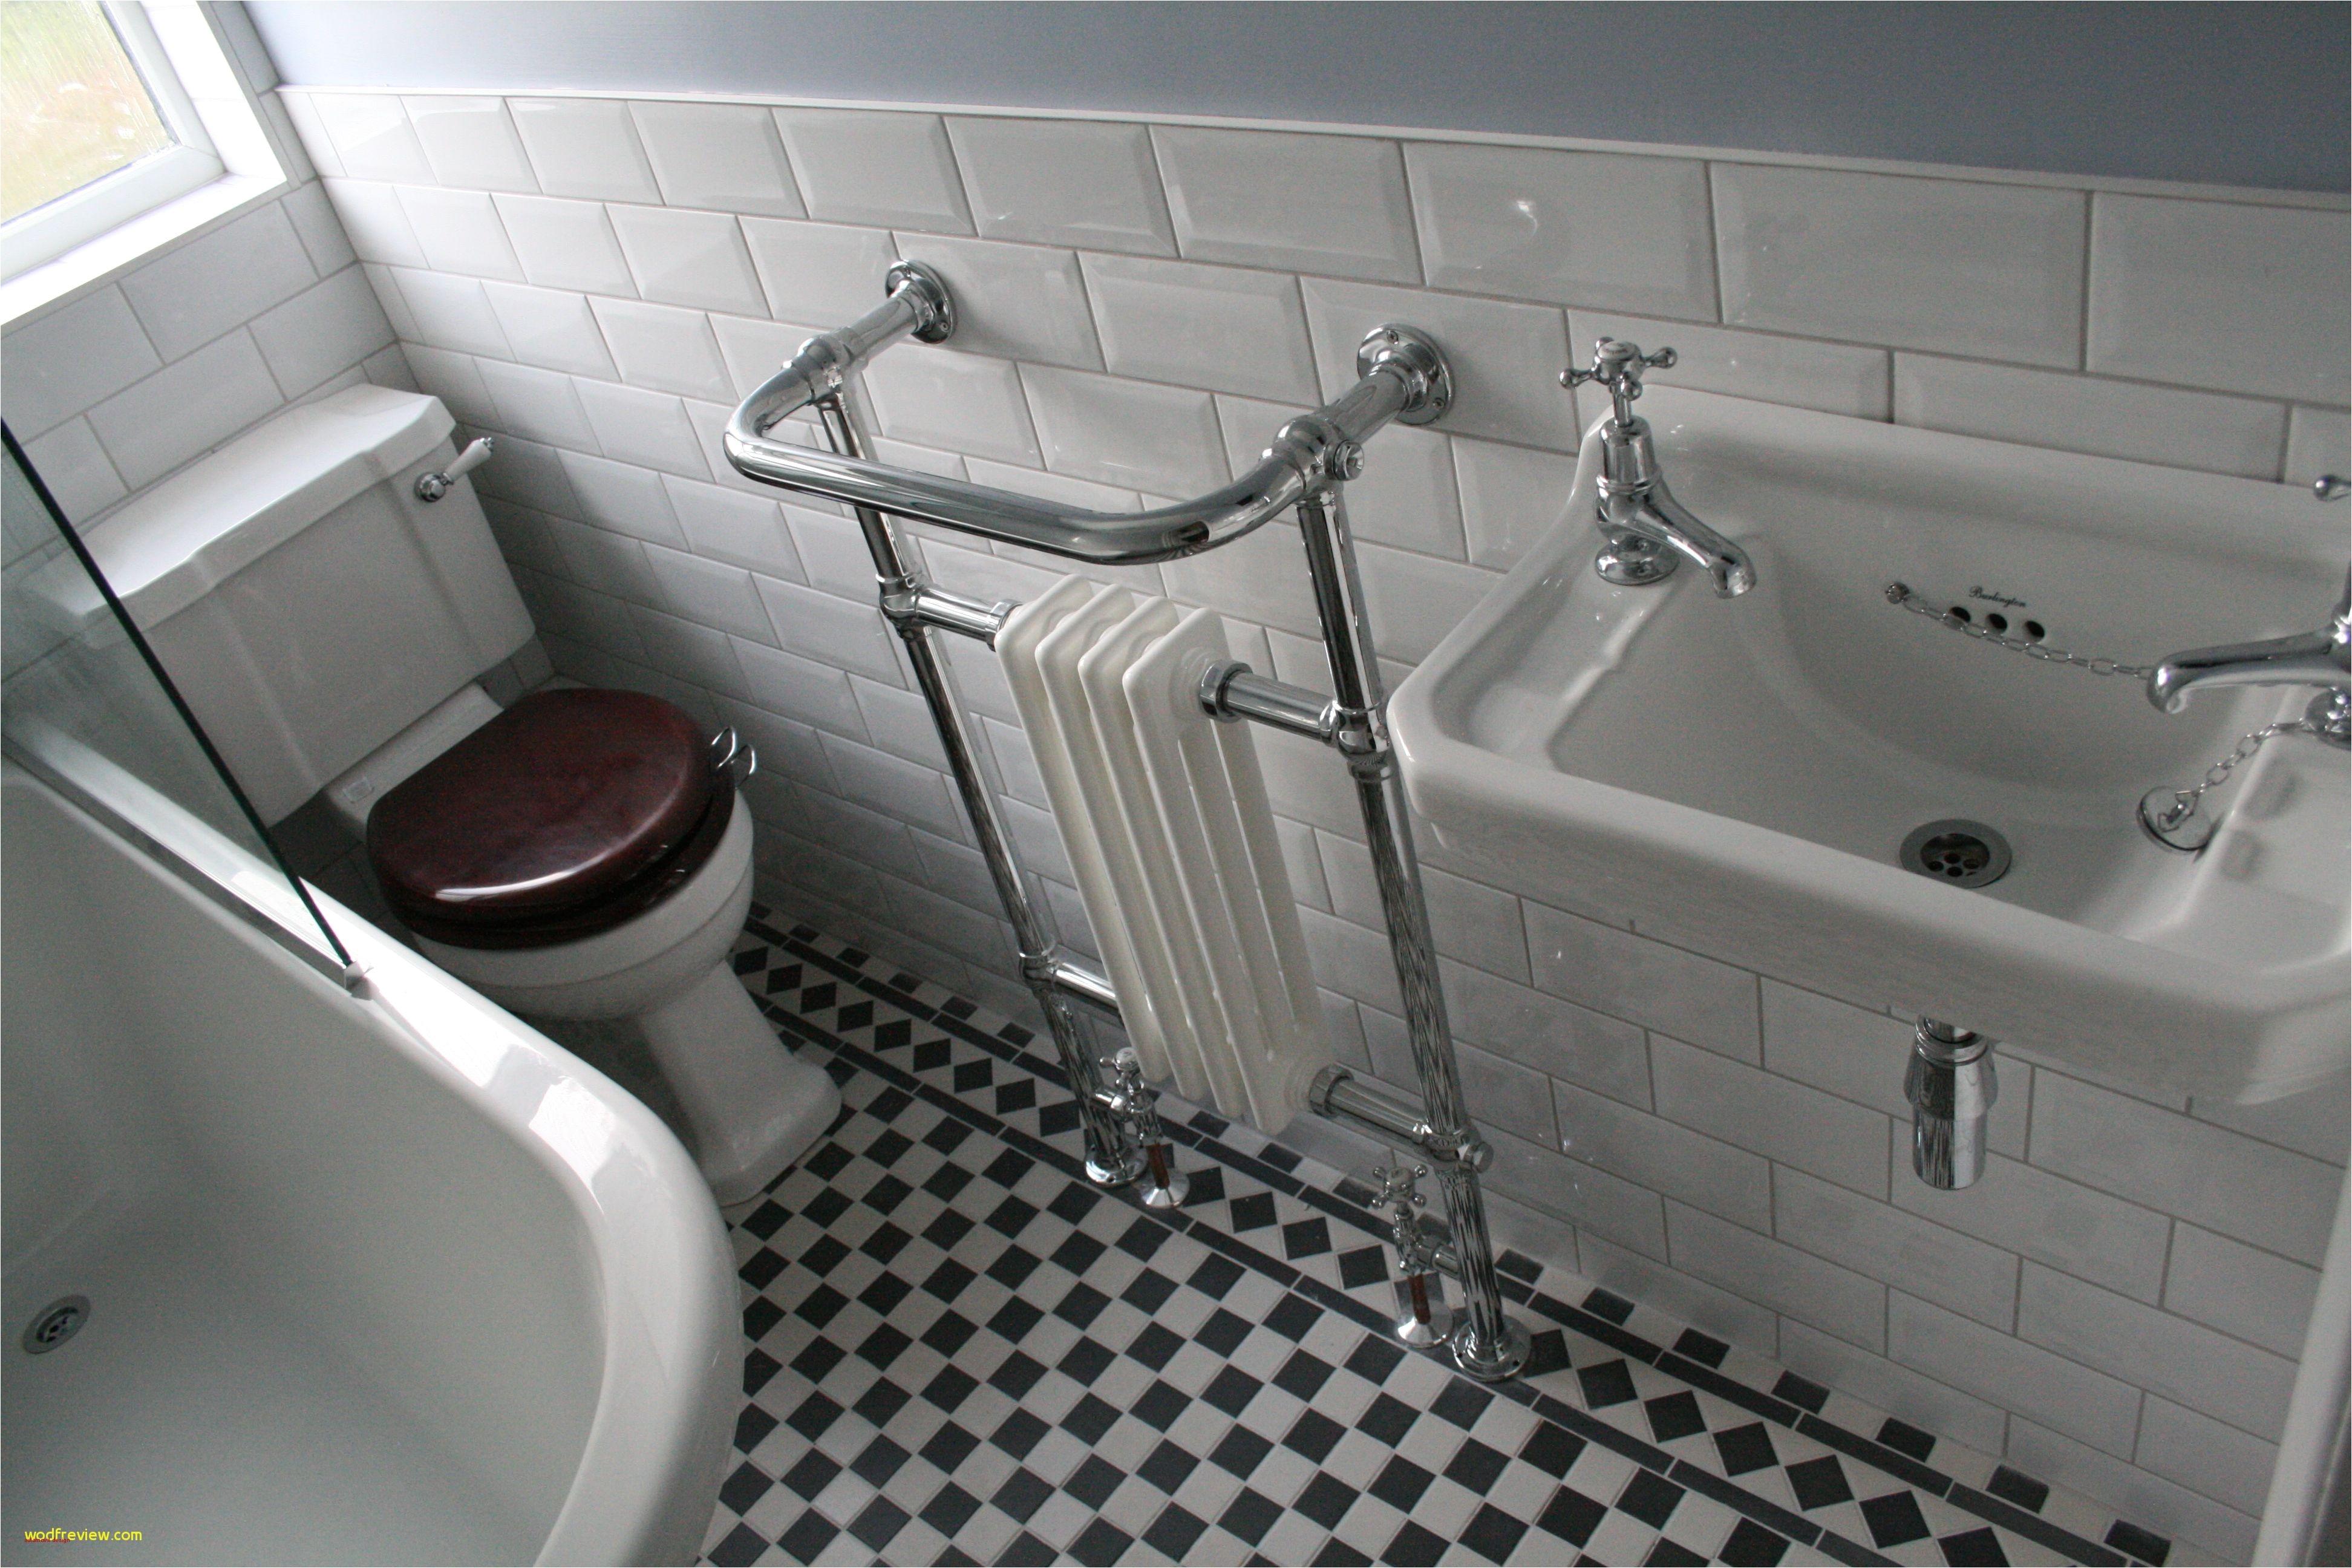 wallpaper for small bathrooms small bathroom design ideas luxury bathroom designer 0d tag